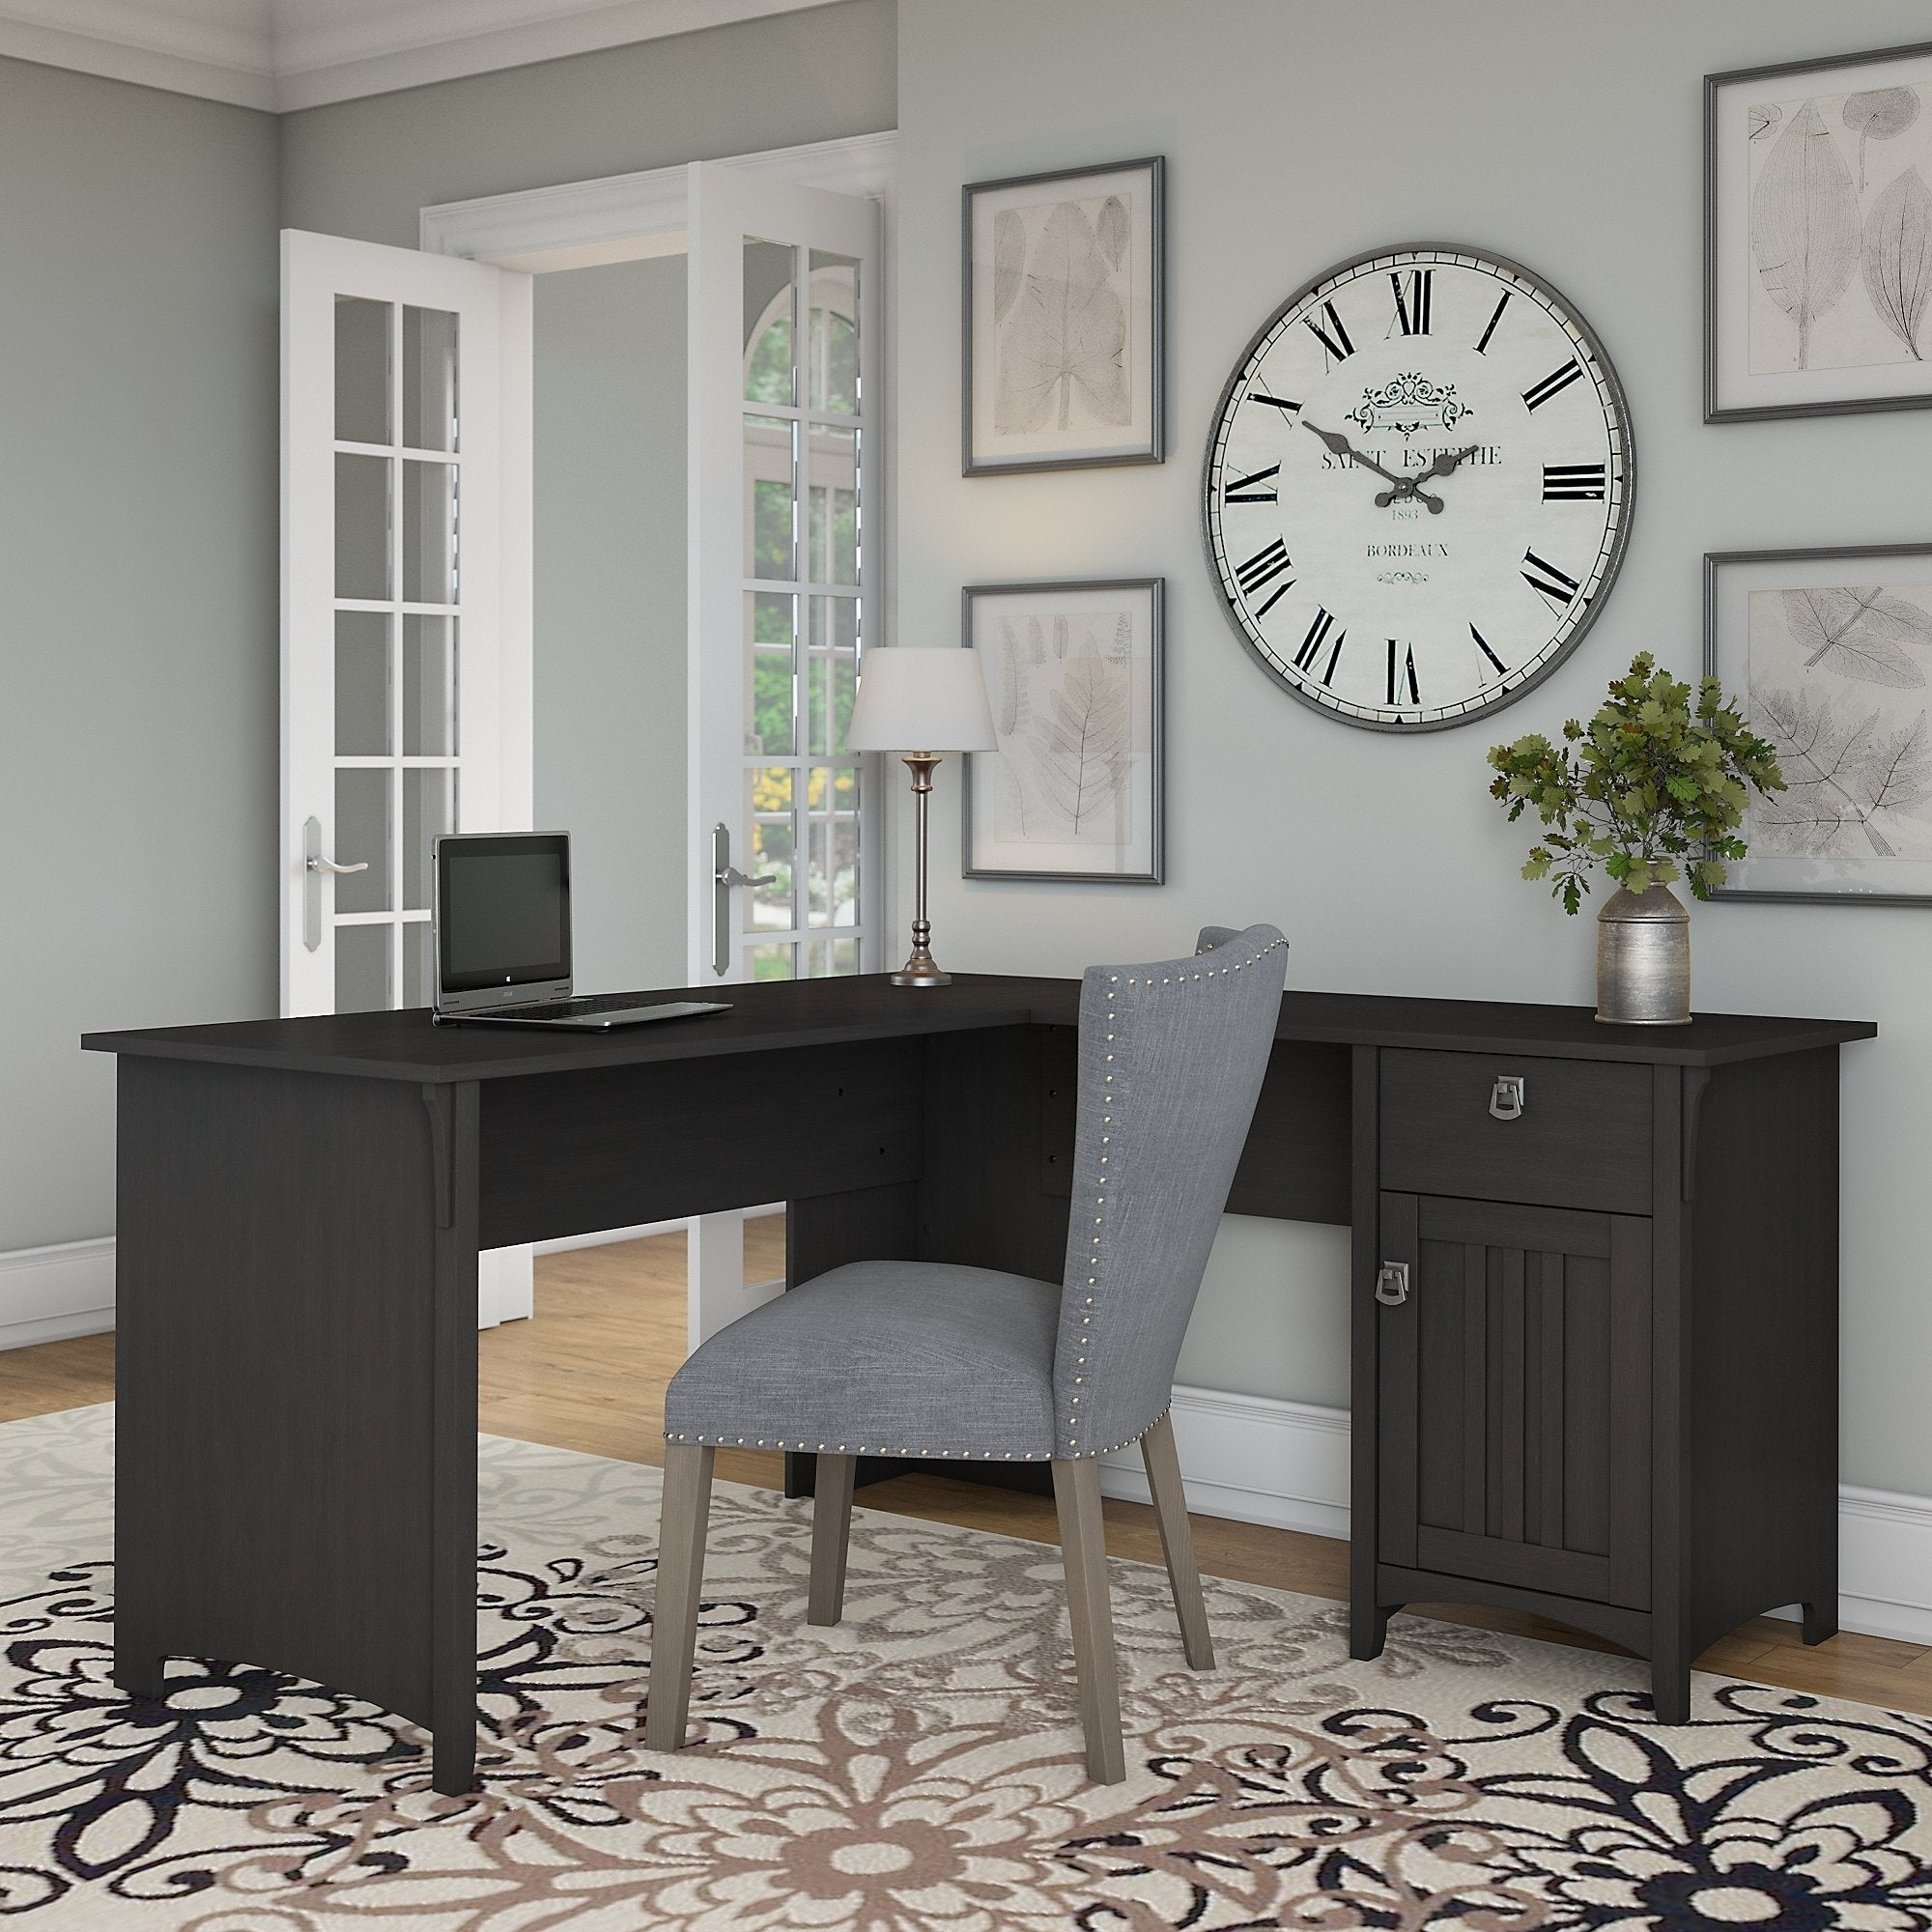 The Gray Barn Lowbridge L Shaped Desk With Storage In Vintage Black